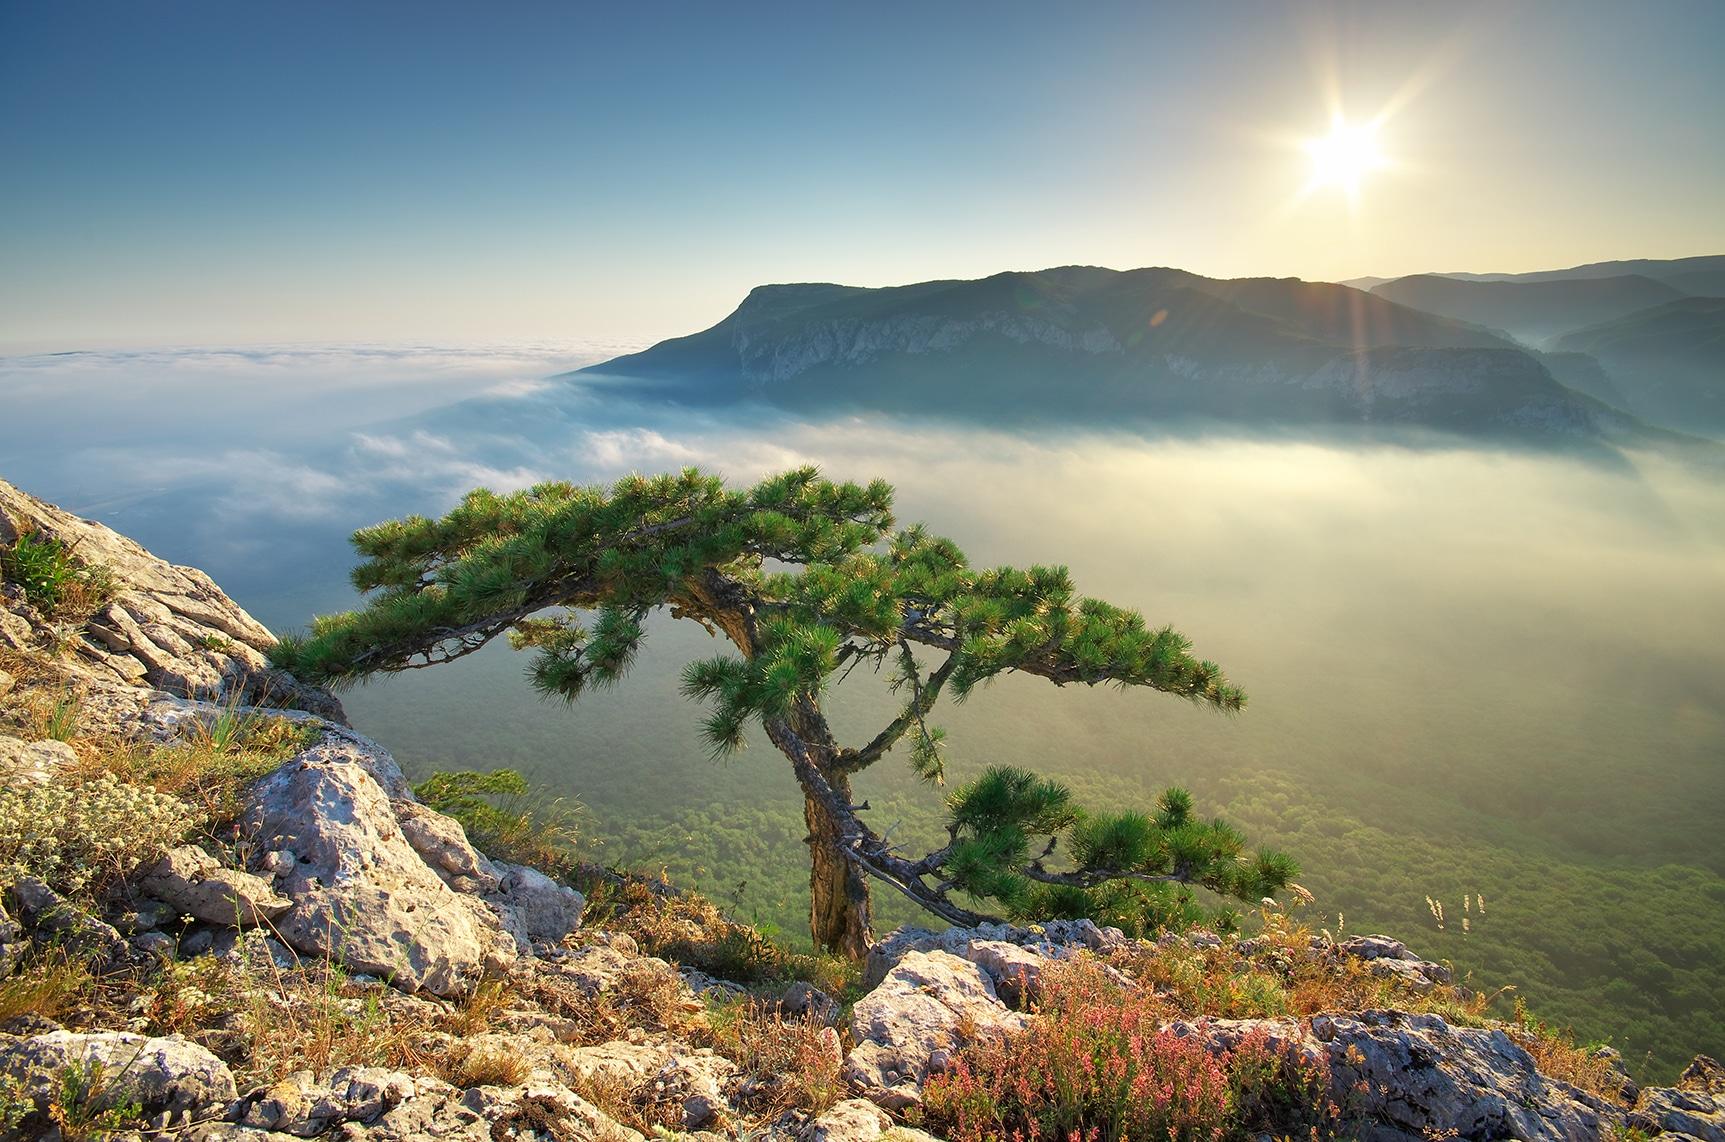 Inspirational Mountain Scene